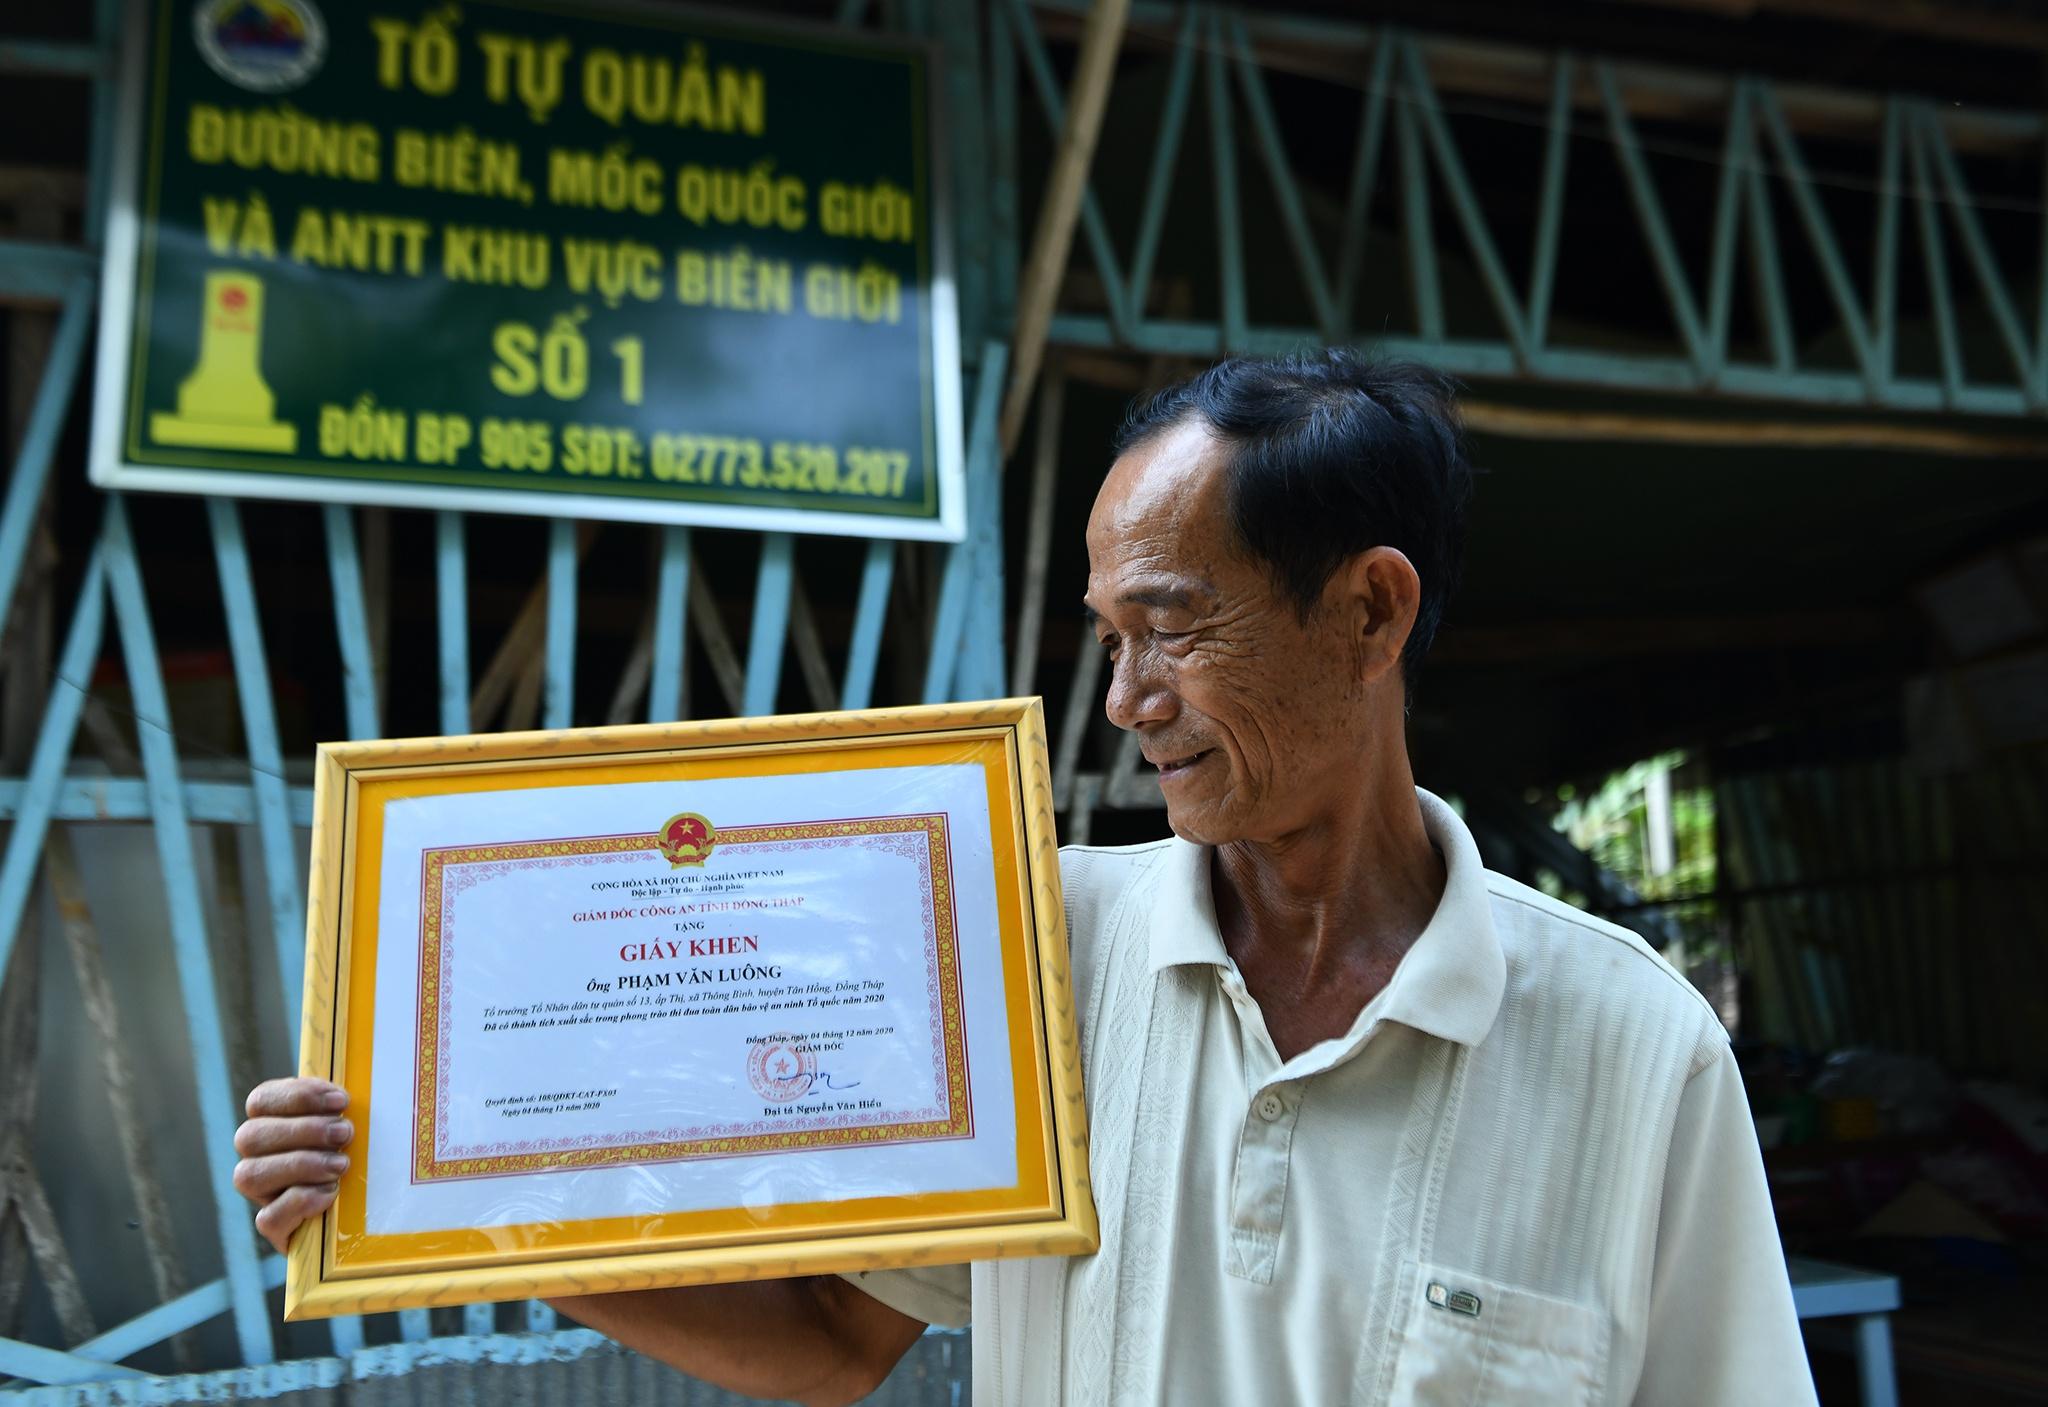 Xom bien gioi Thong Binh phong dich Covid-19 anh 23